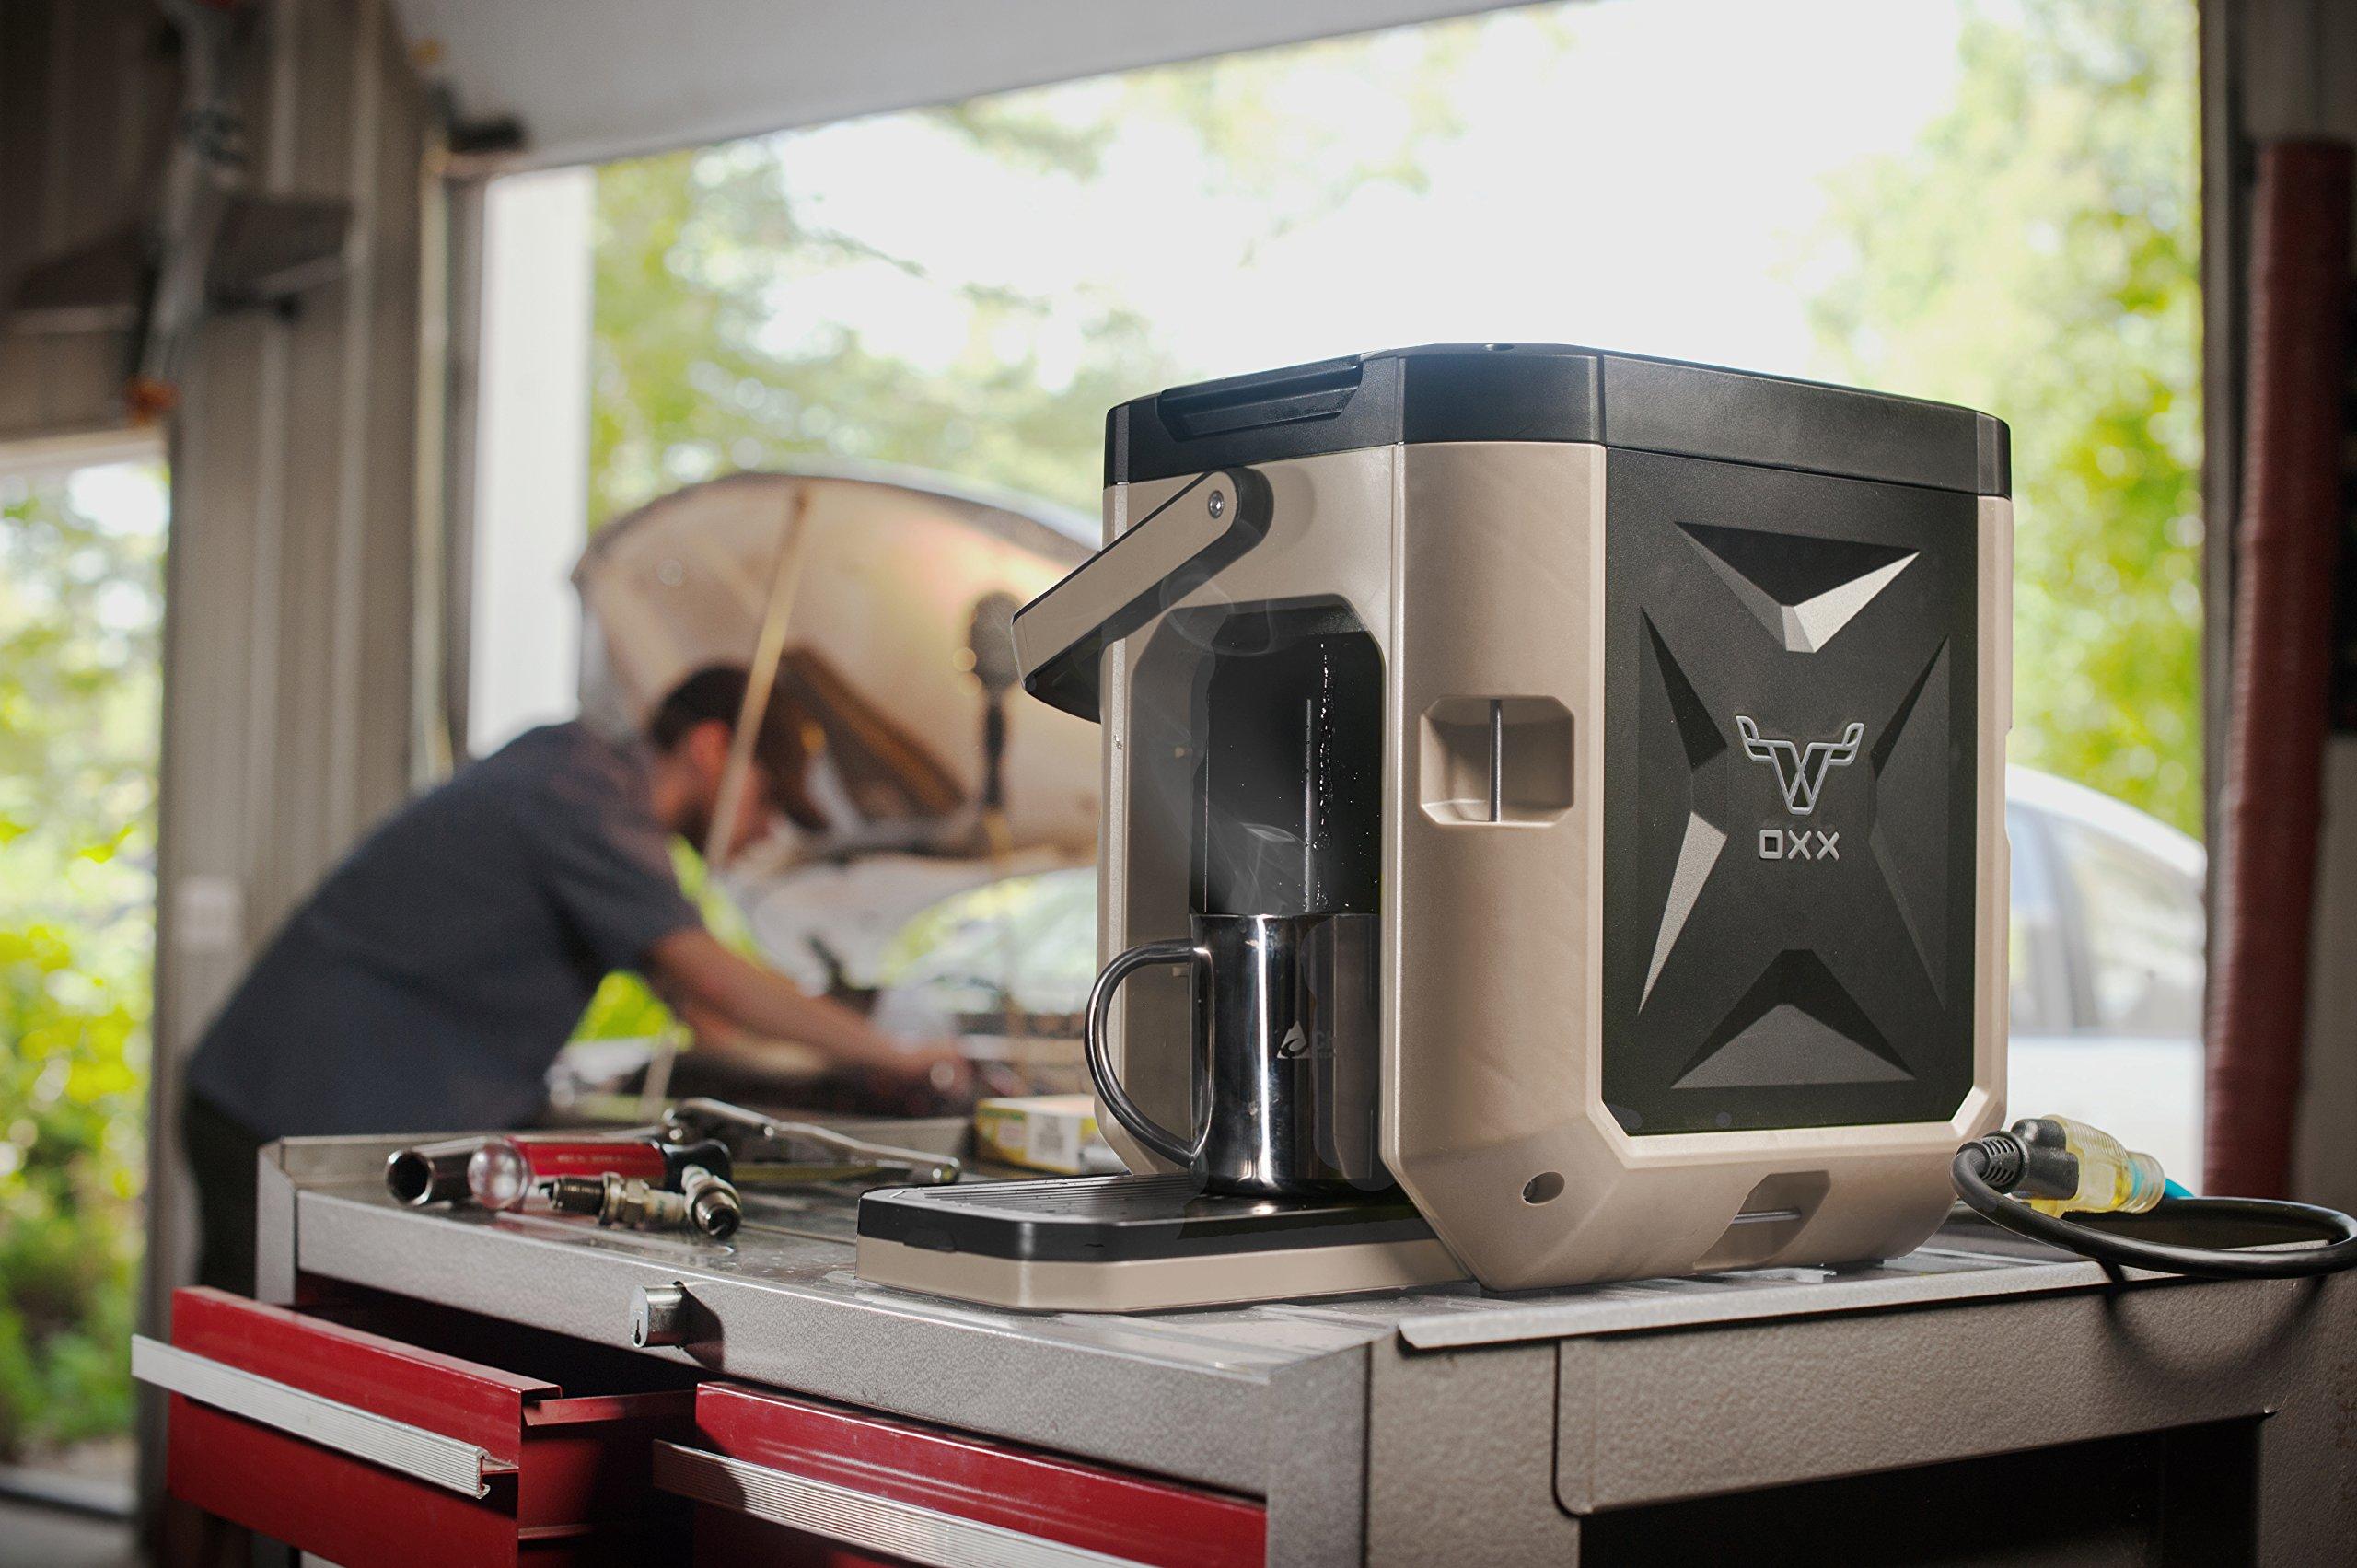 OXX COFFEEBOXX Job Site Single Serve Coffee Maker, Desert Tan by Oxx Inc (Image #7)